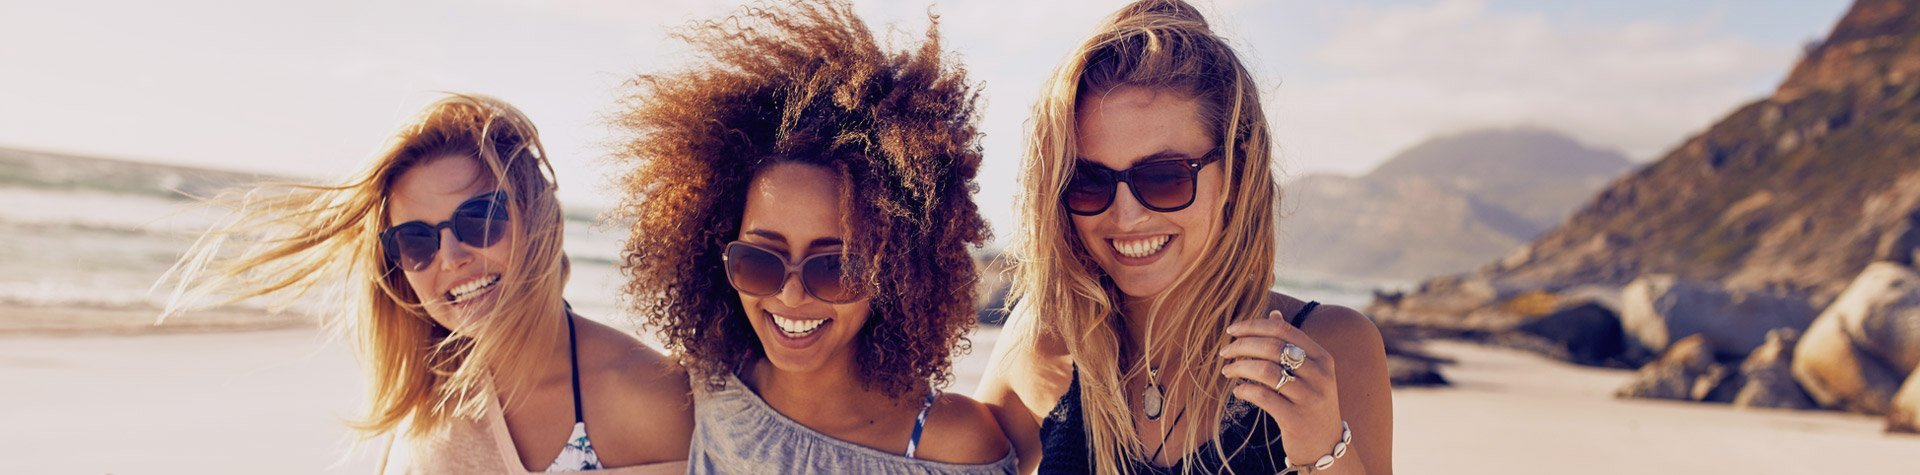 three girls walking along beach smiling